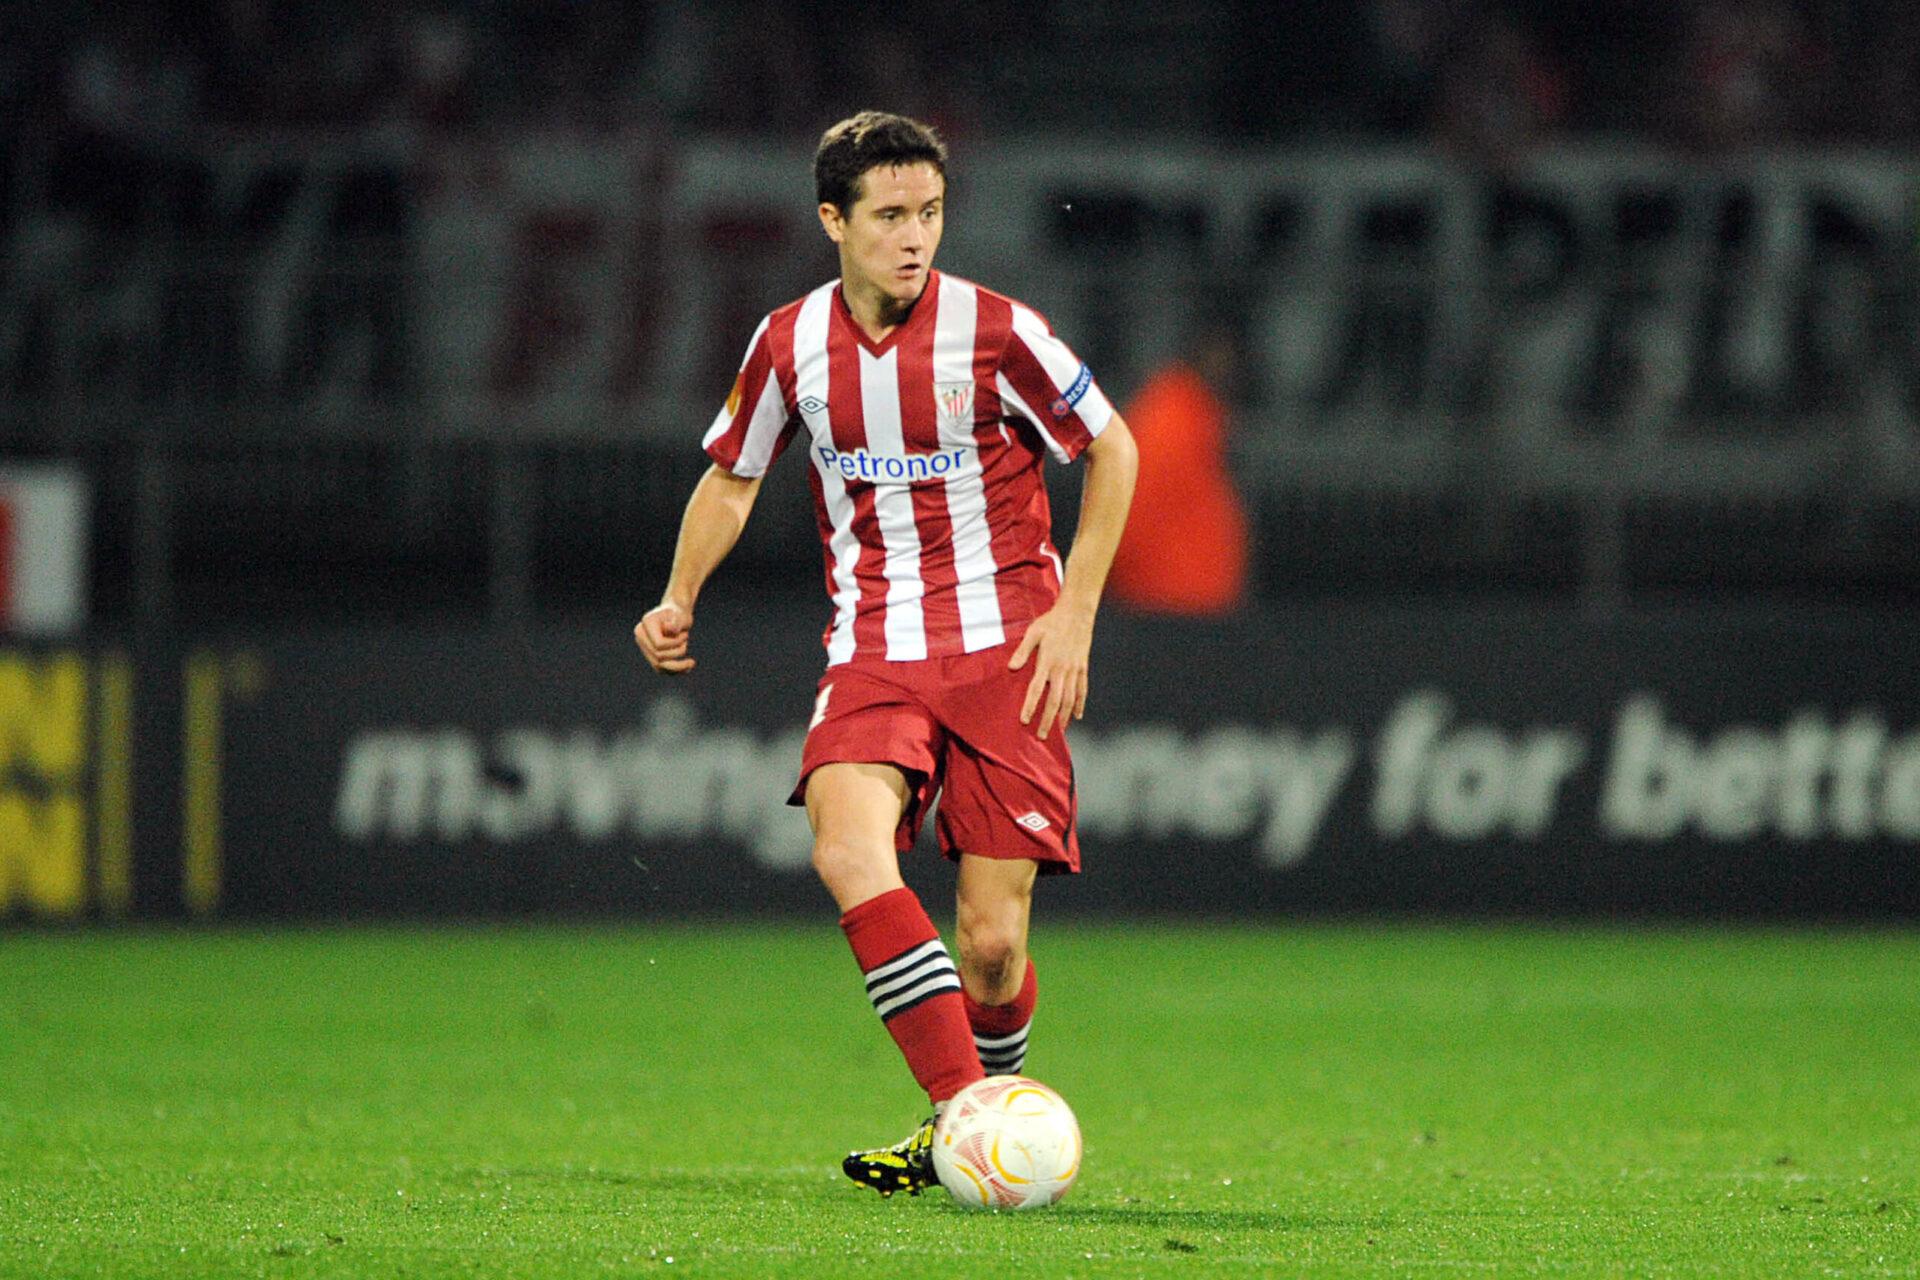 Ander Herrera sous les couleurs de l'Athlétic Bilbao (Icon Sport)